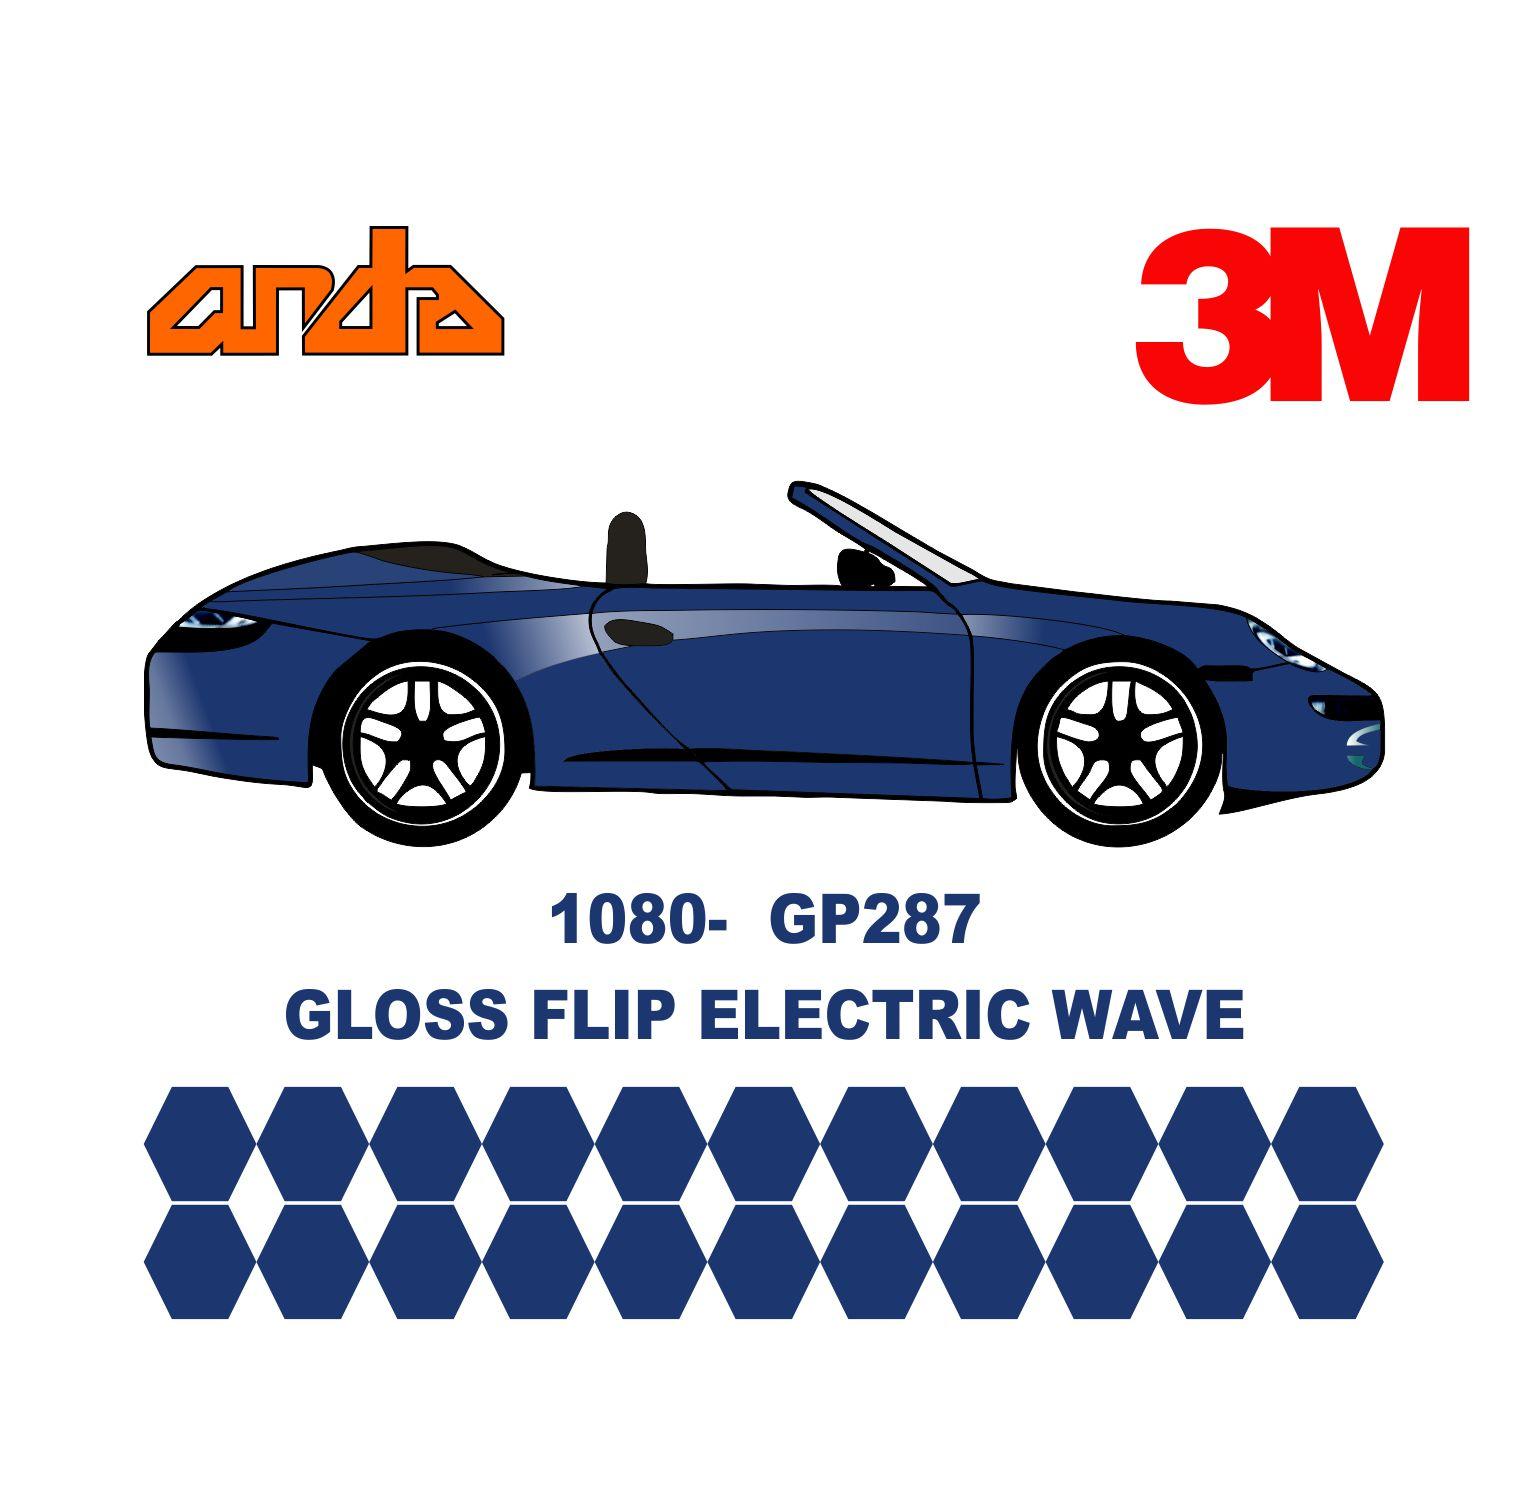 3M 1080-GP287 Gloss Flip Electric Wave 1